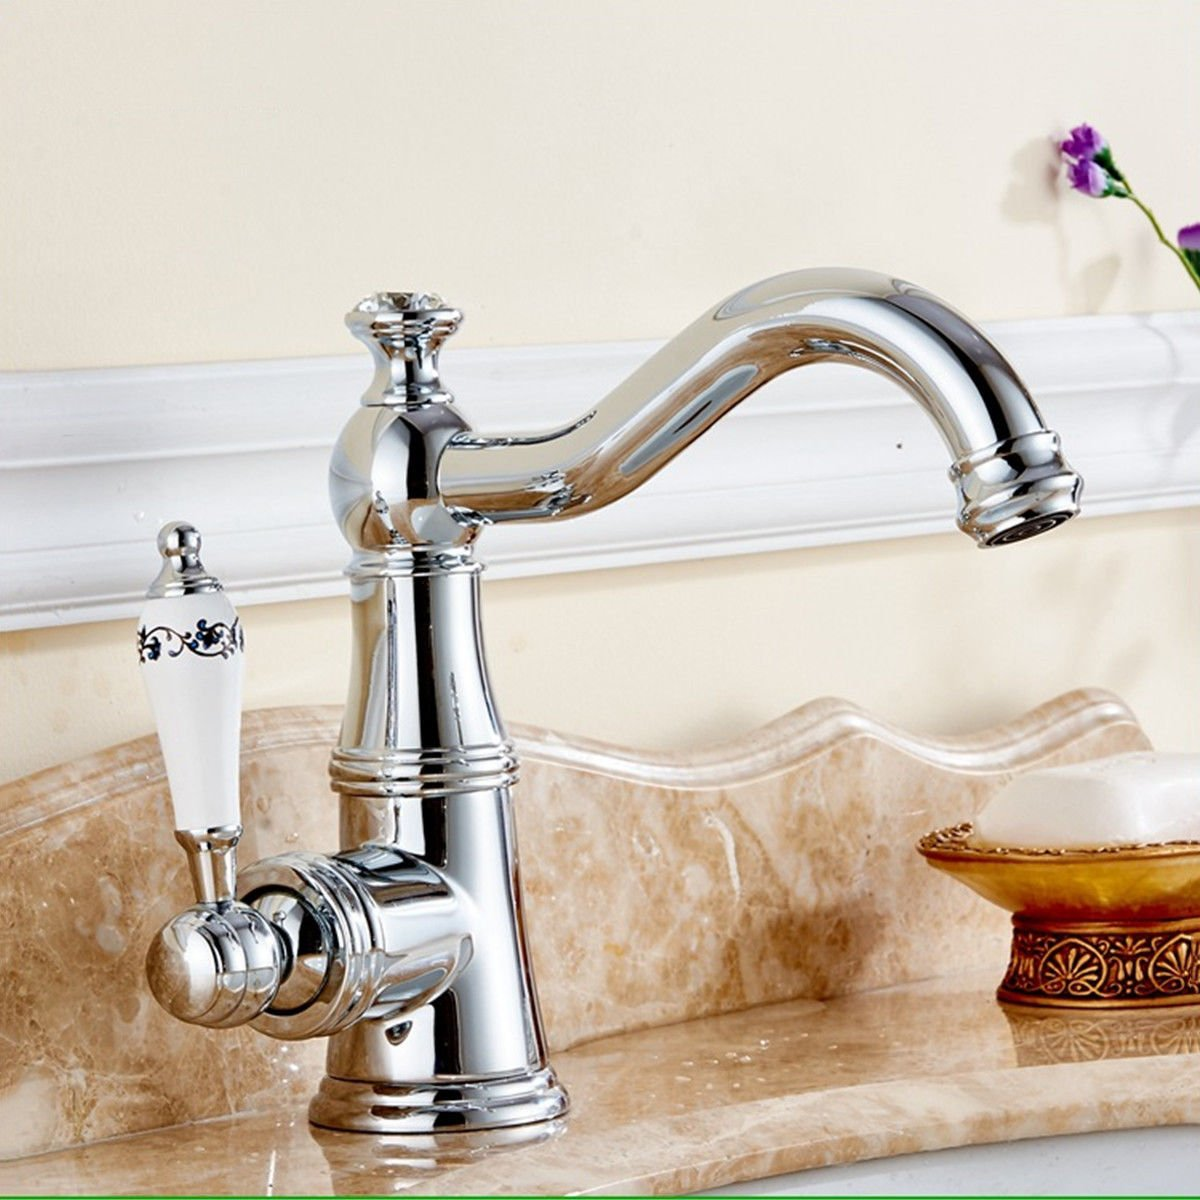 LHbox Basin Mixer Tap Bathroom Sink Faucet Euro-copper plated, chrome bathroom basin bathroom sink faucet swivel basin sink faucet hot and cold-water faucet